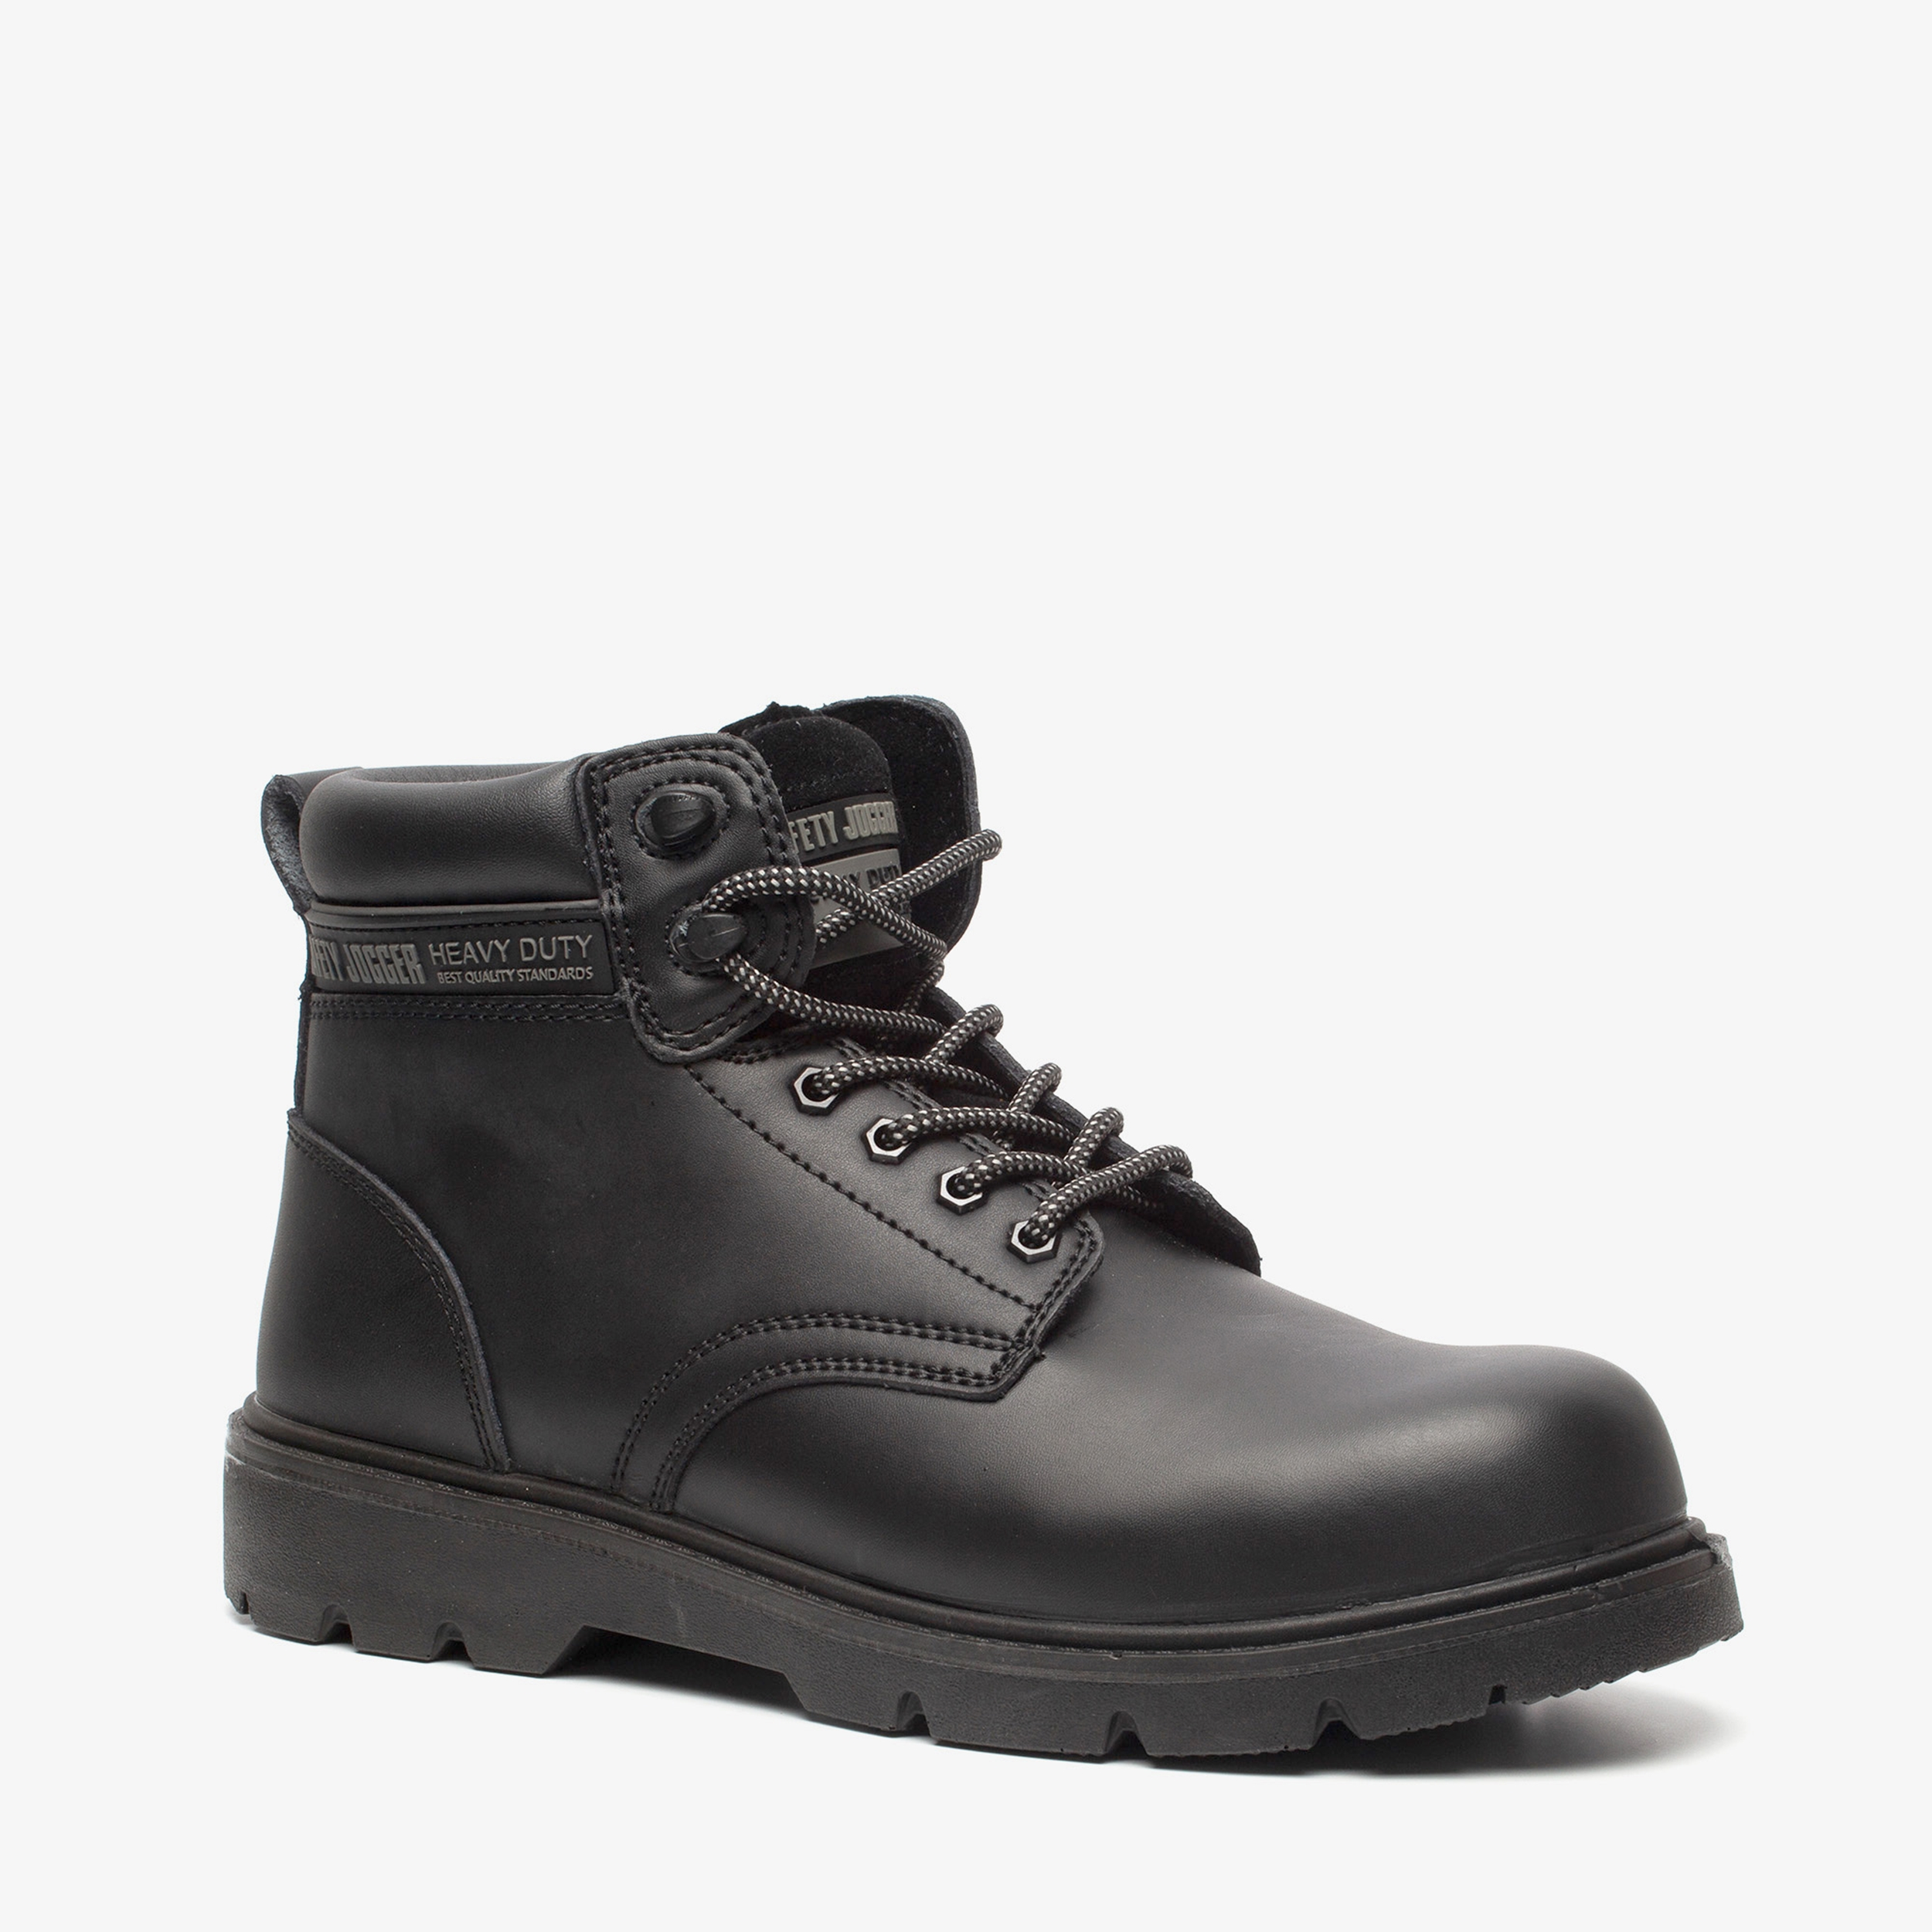 Werkschoenen Safety Jogger.Safety Jogger Leren Heren Werkschoenen Online Bestellen Scapino